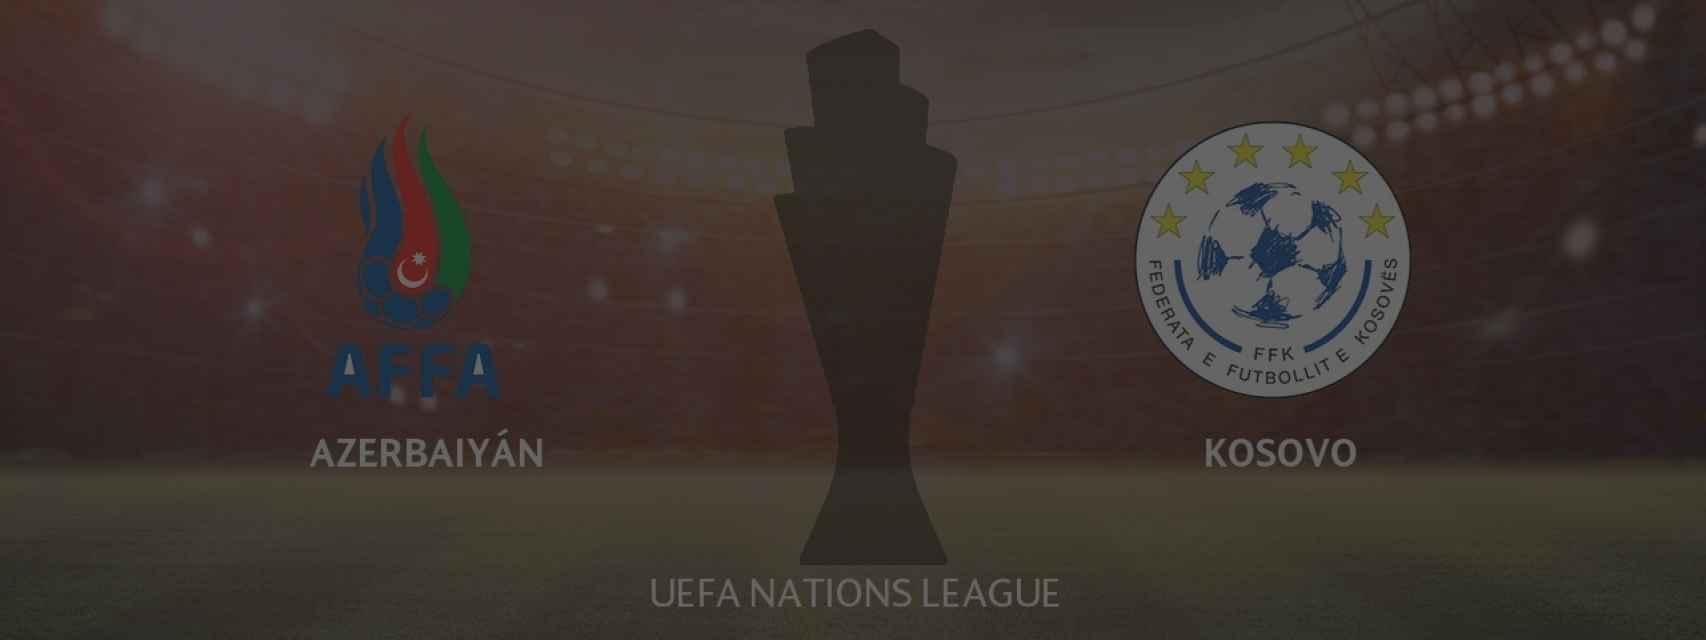 Azerbaiyán - Kosovo, UEFA Nations League